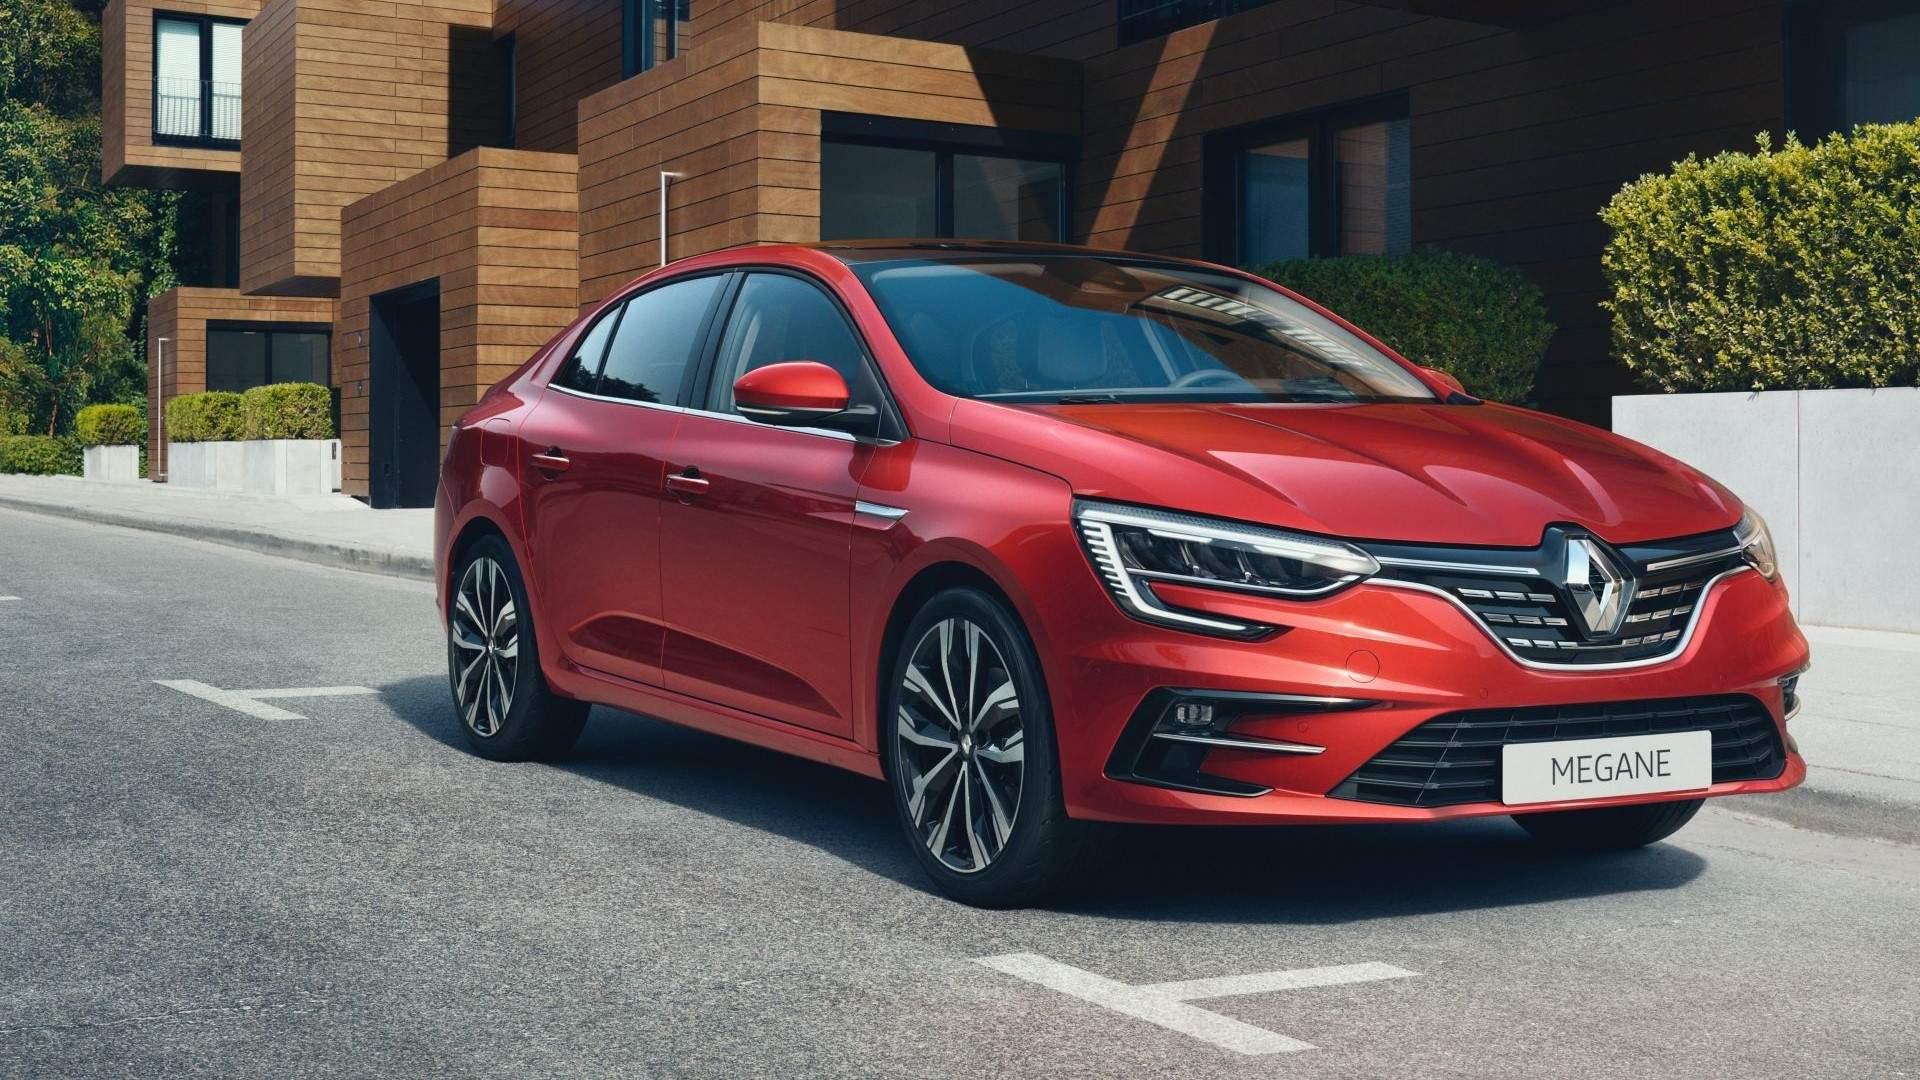 Renault Mégane Sedán 2021, la berlina compacta del rombo se actualiza